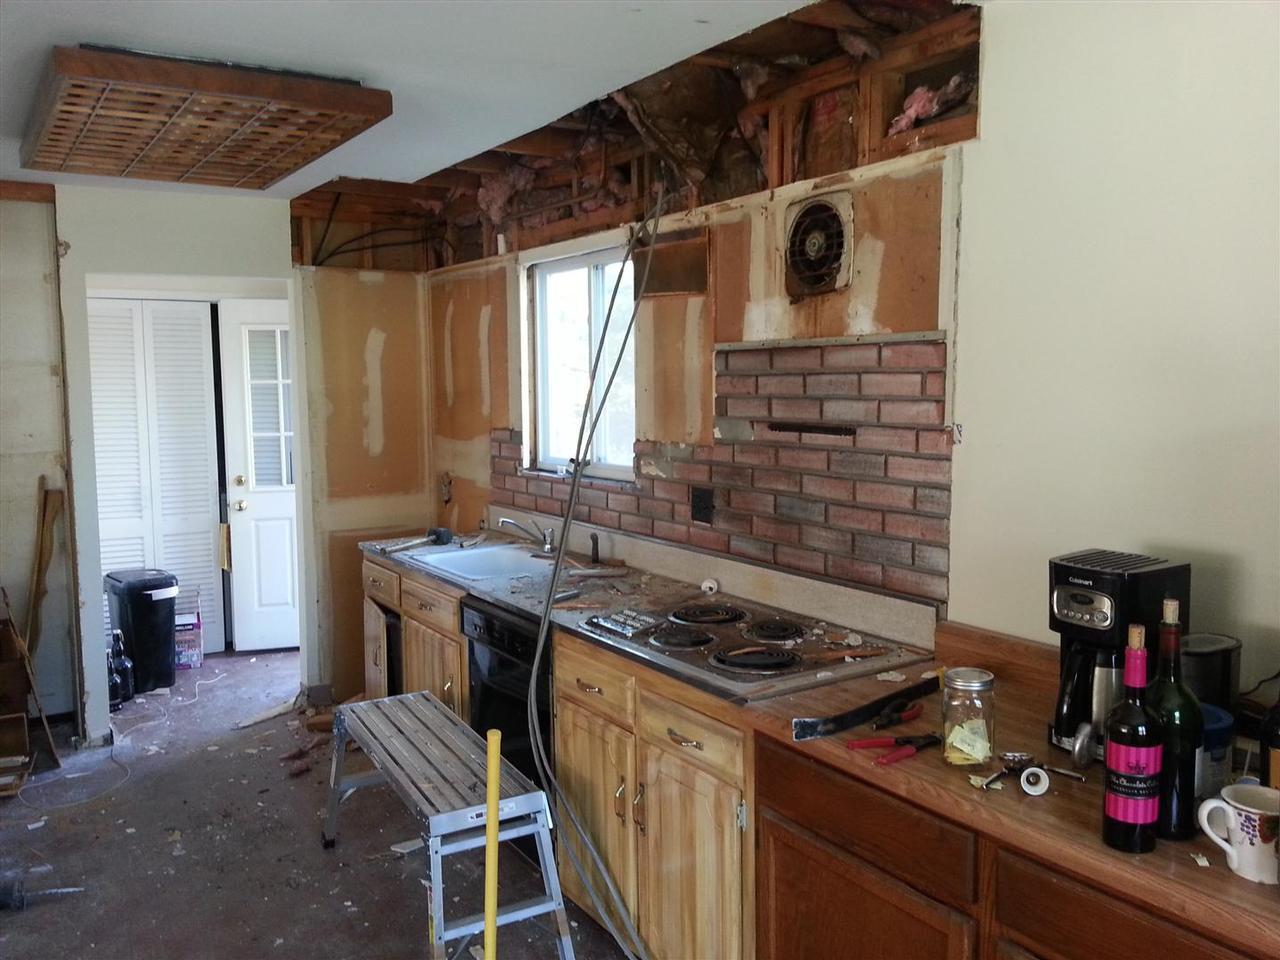 BAD renovations - Kitchen Renovation Part 1